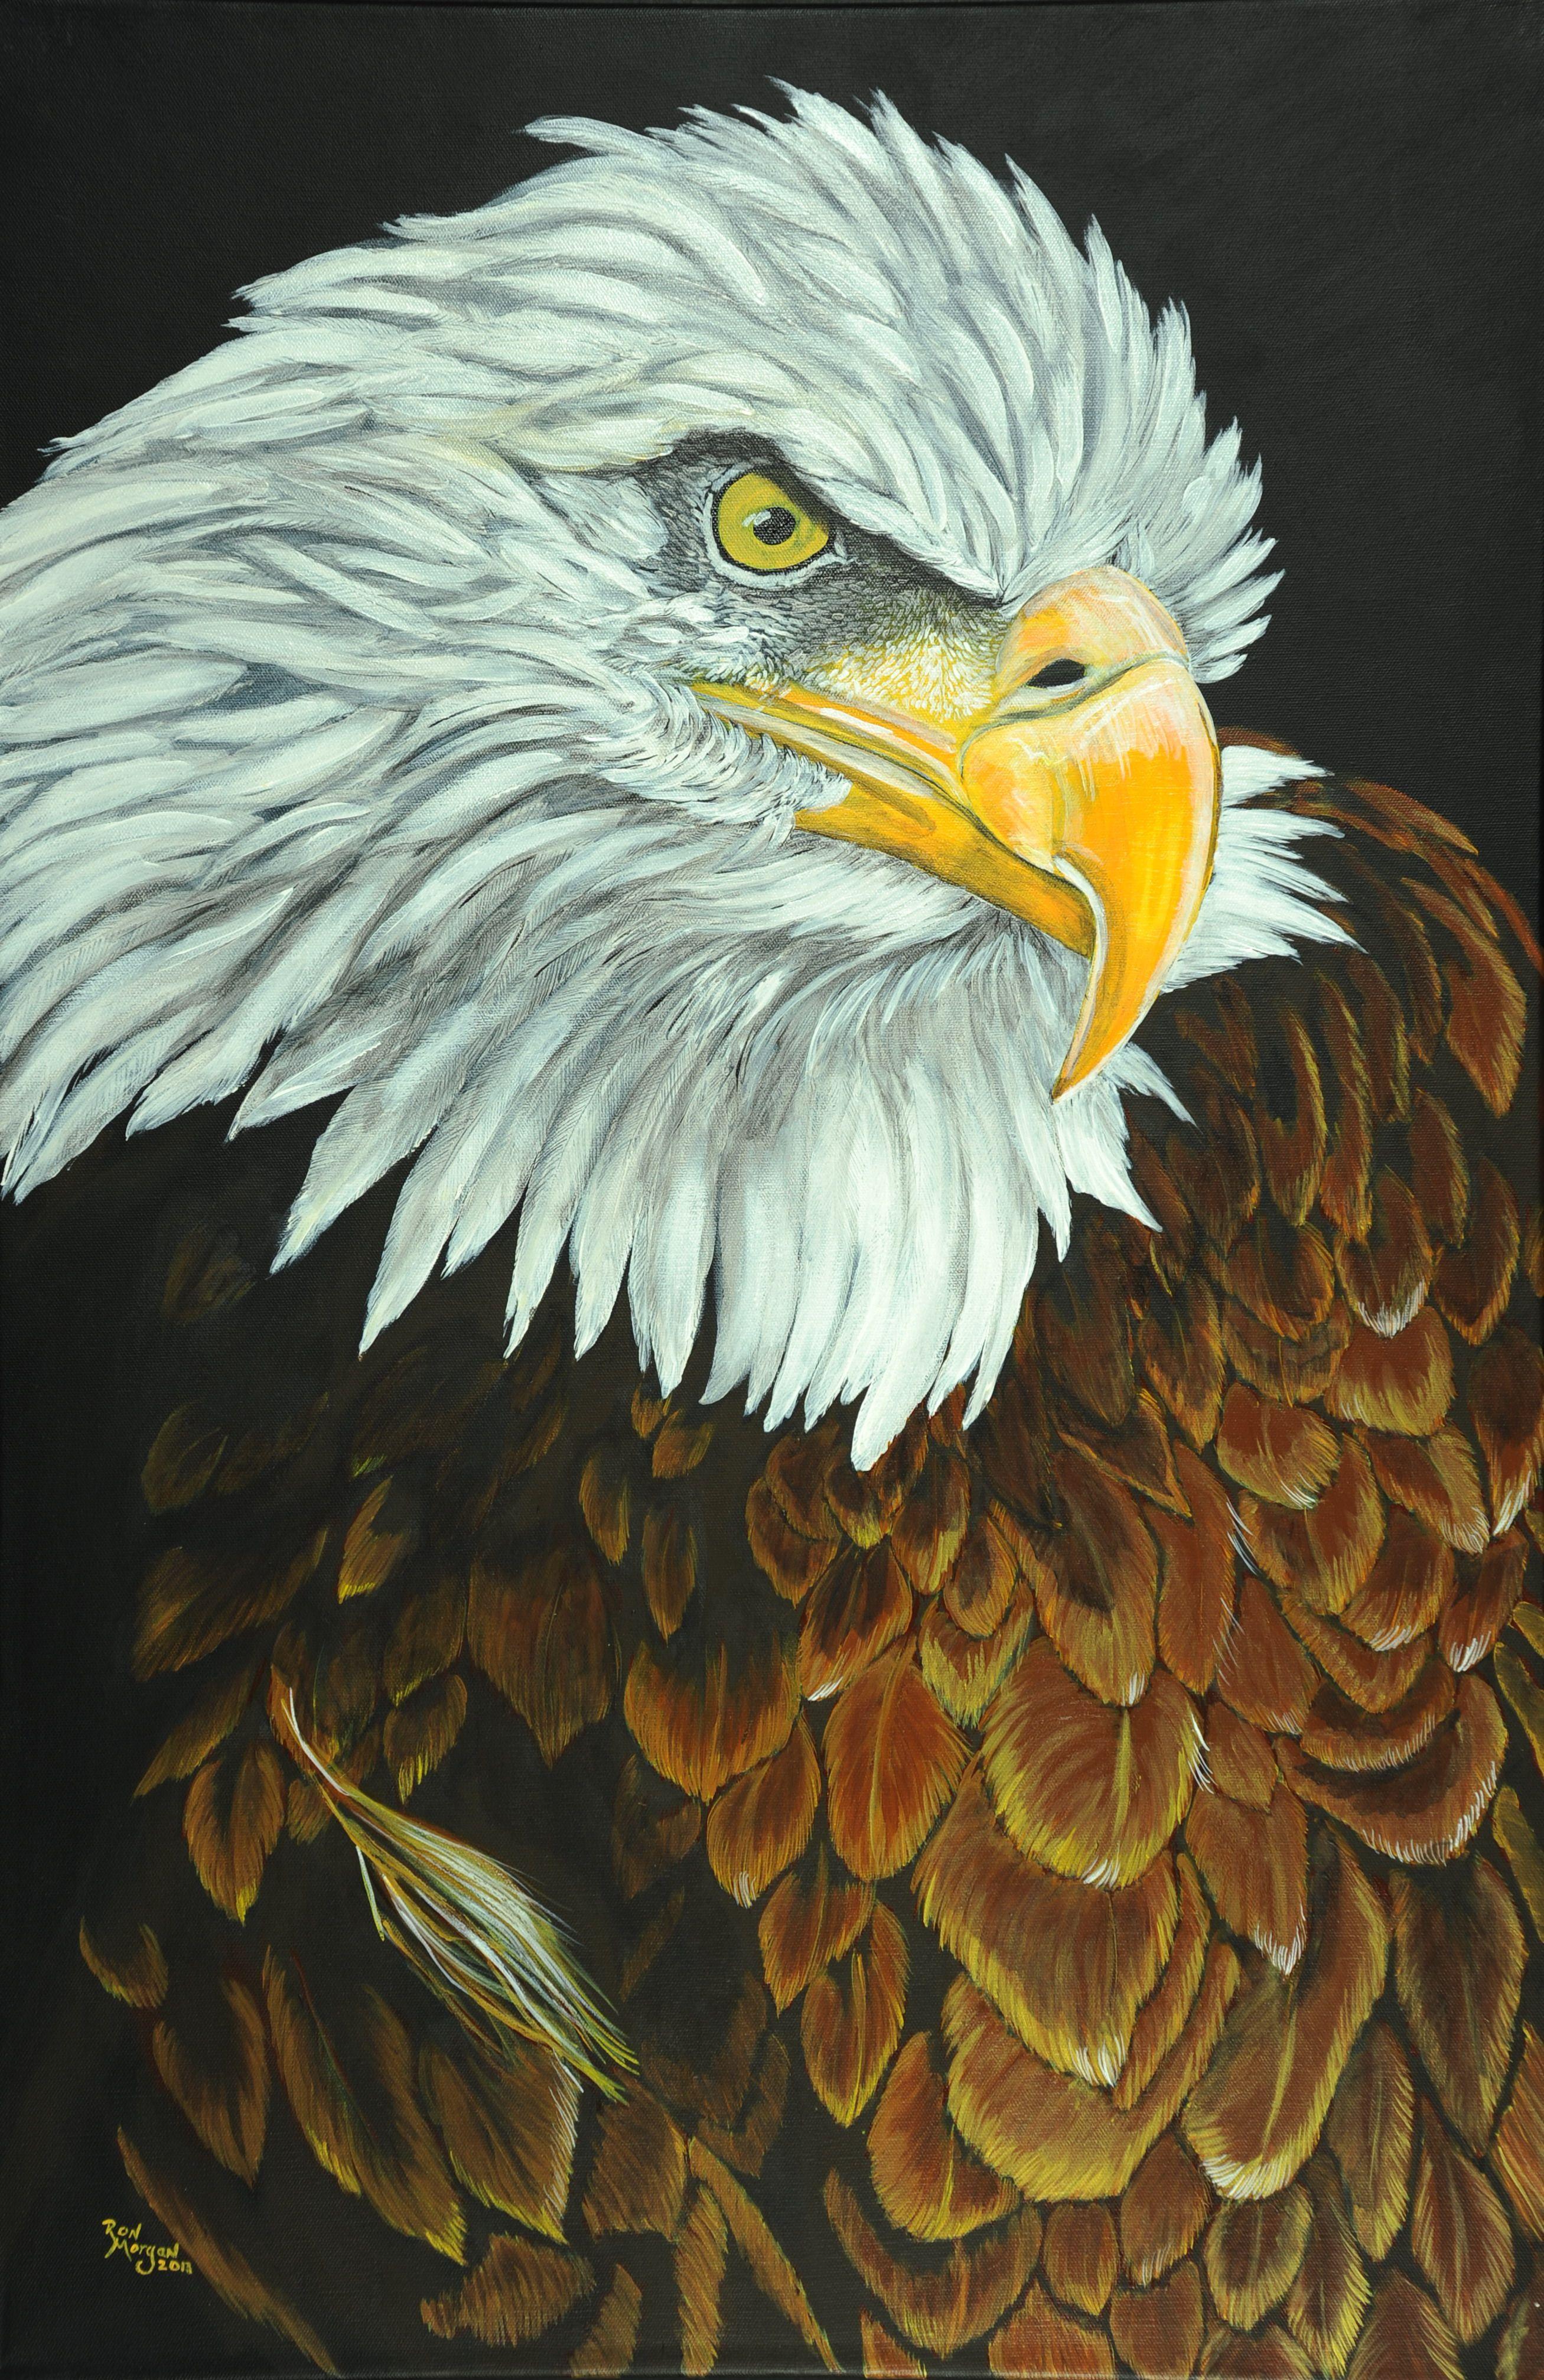 """Eagle With Attitude"" 24"" x 36"" acrylic on canvas. Eagle"